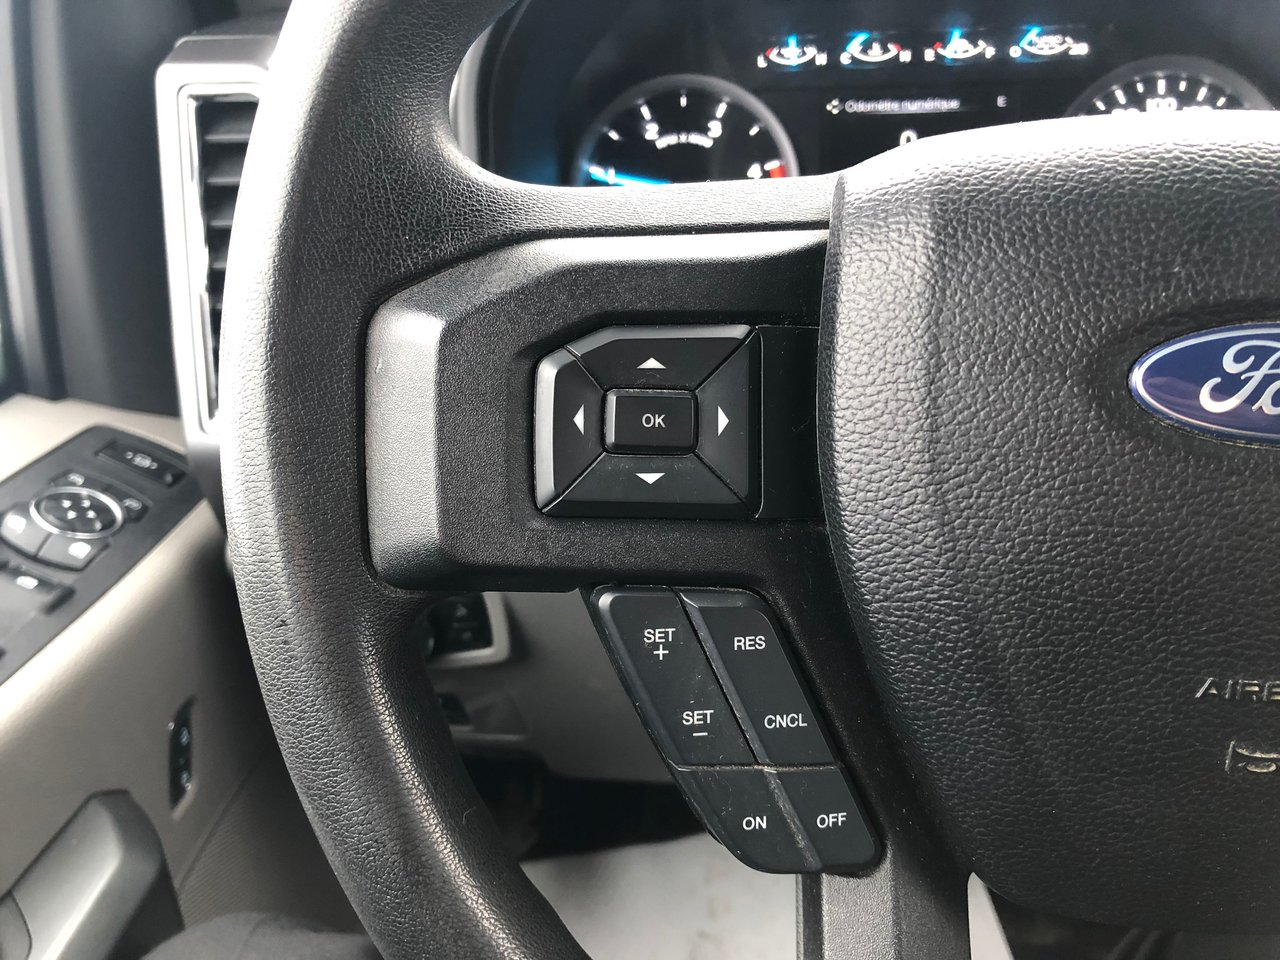 2017 Ford Super Duty F-250 SRW XLT 6.7L POWERSROKE BOITE 8 PIED